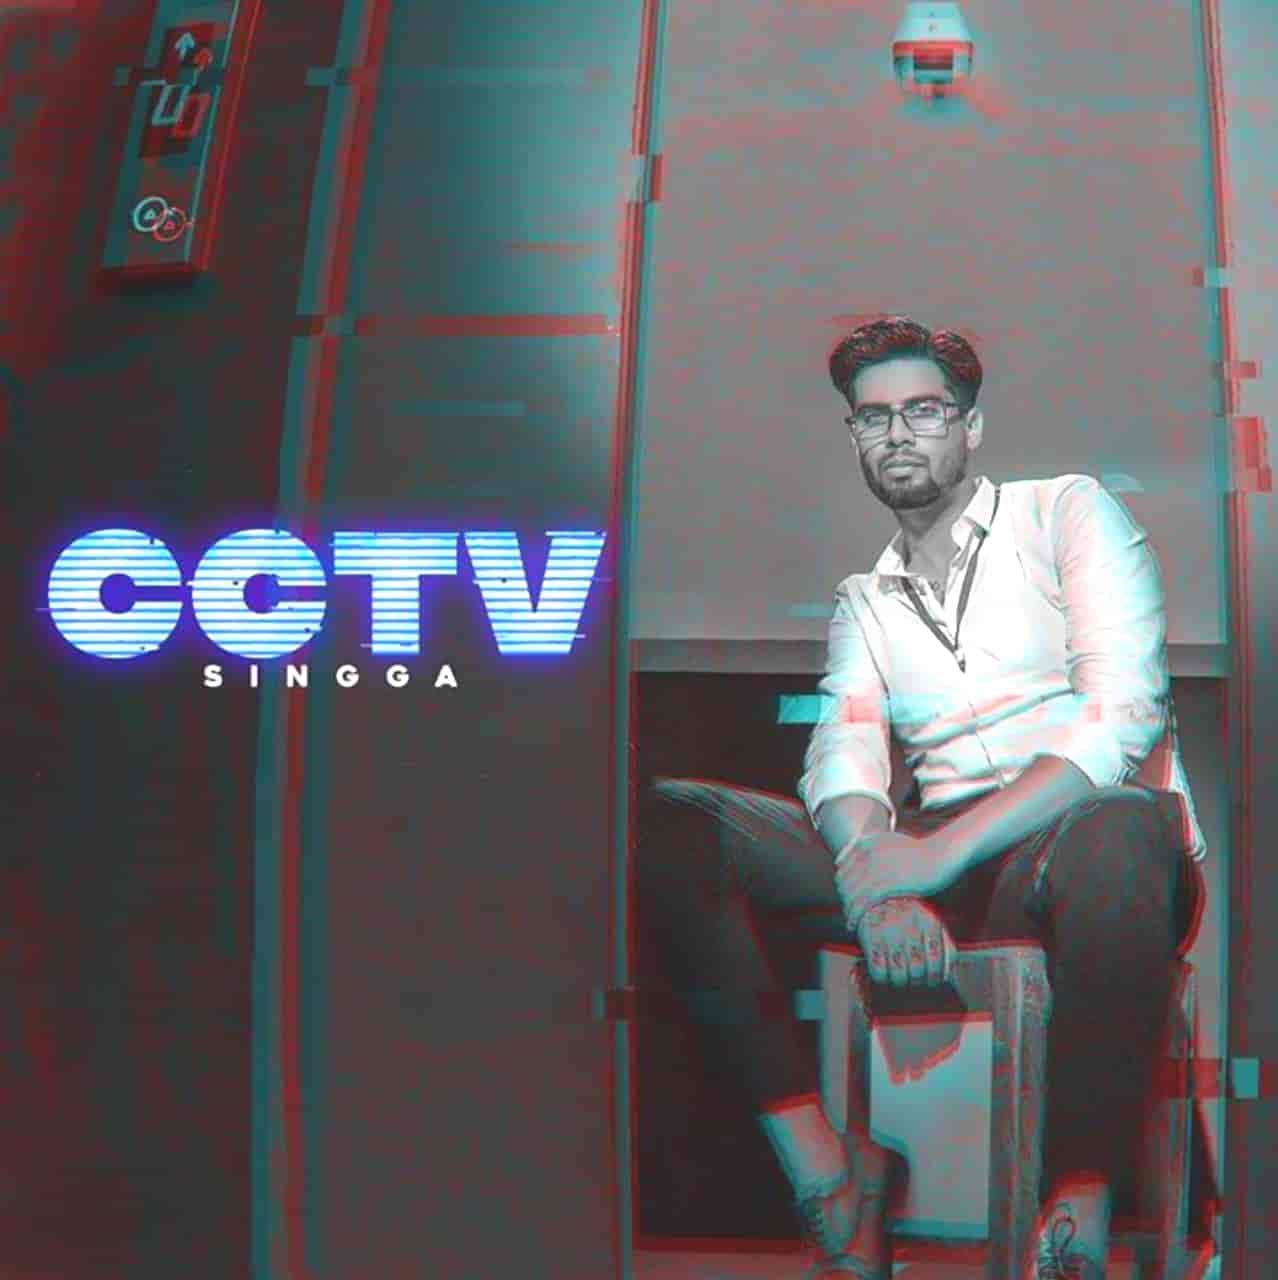 CCTV Punjabi Song Image Features Singga